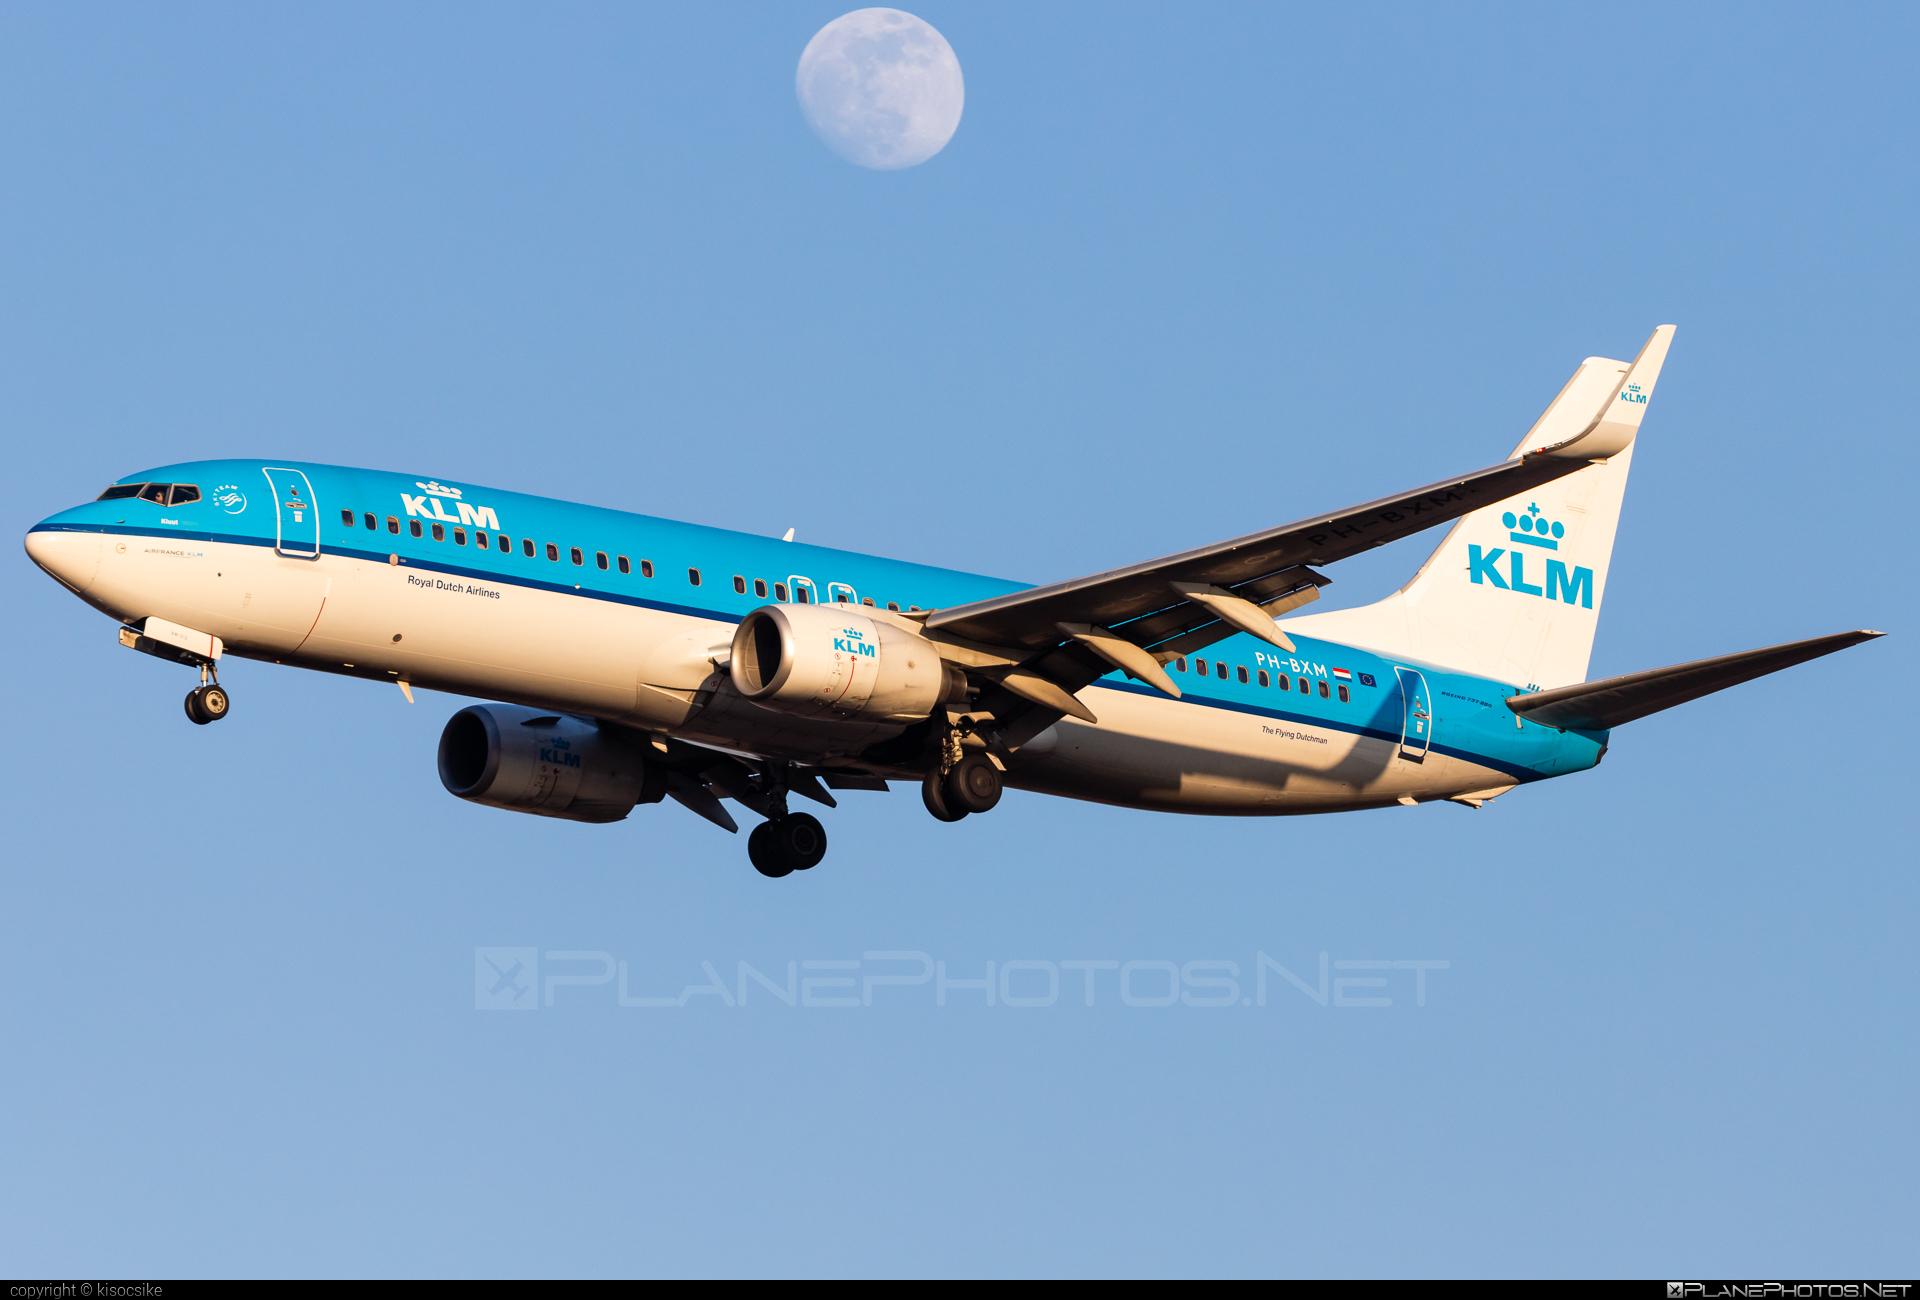 Boeing 737-800 - PH-BXM operated by KLM Royal Dutch Airlines #b737 #b737nextgen #b737ng #boeing #boeing737 #klm #klmroyaldutchairlines #royaldutchairlines